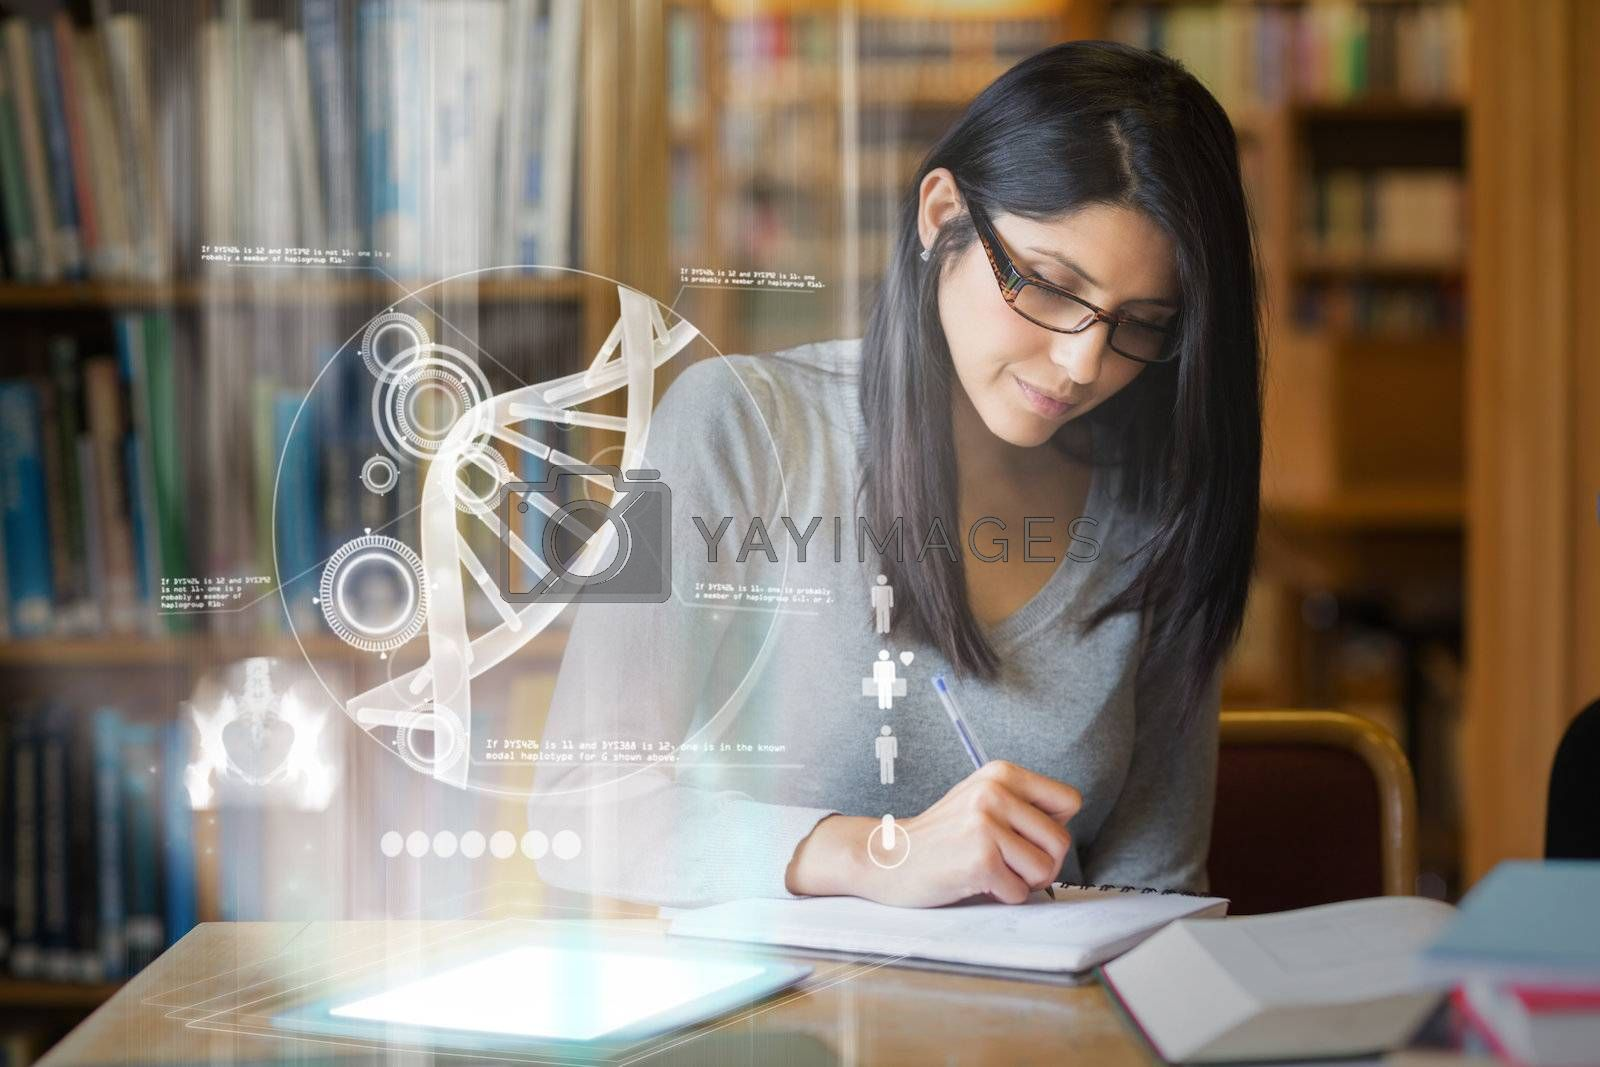 Focused mature student studying medicine on digital interface by Wavebreakmedia